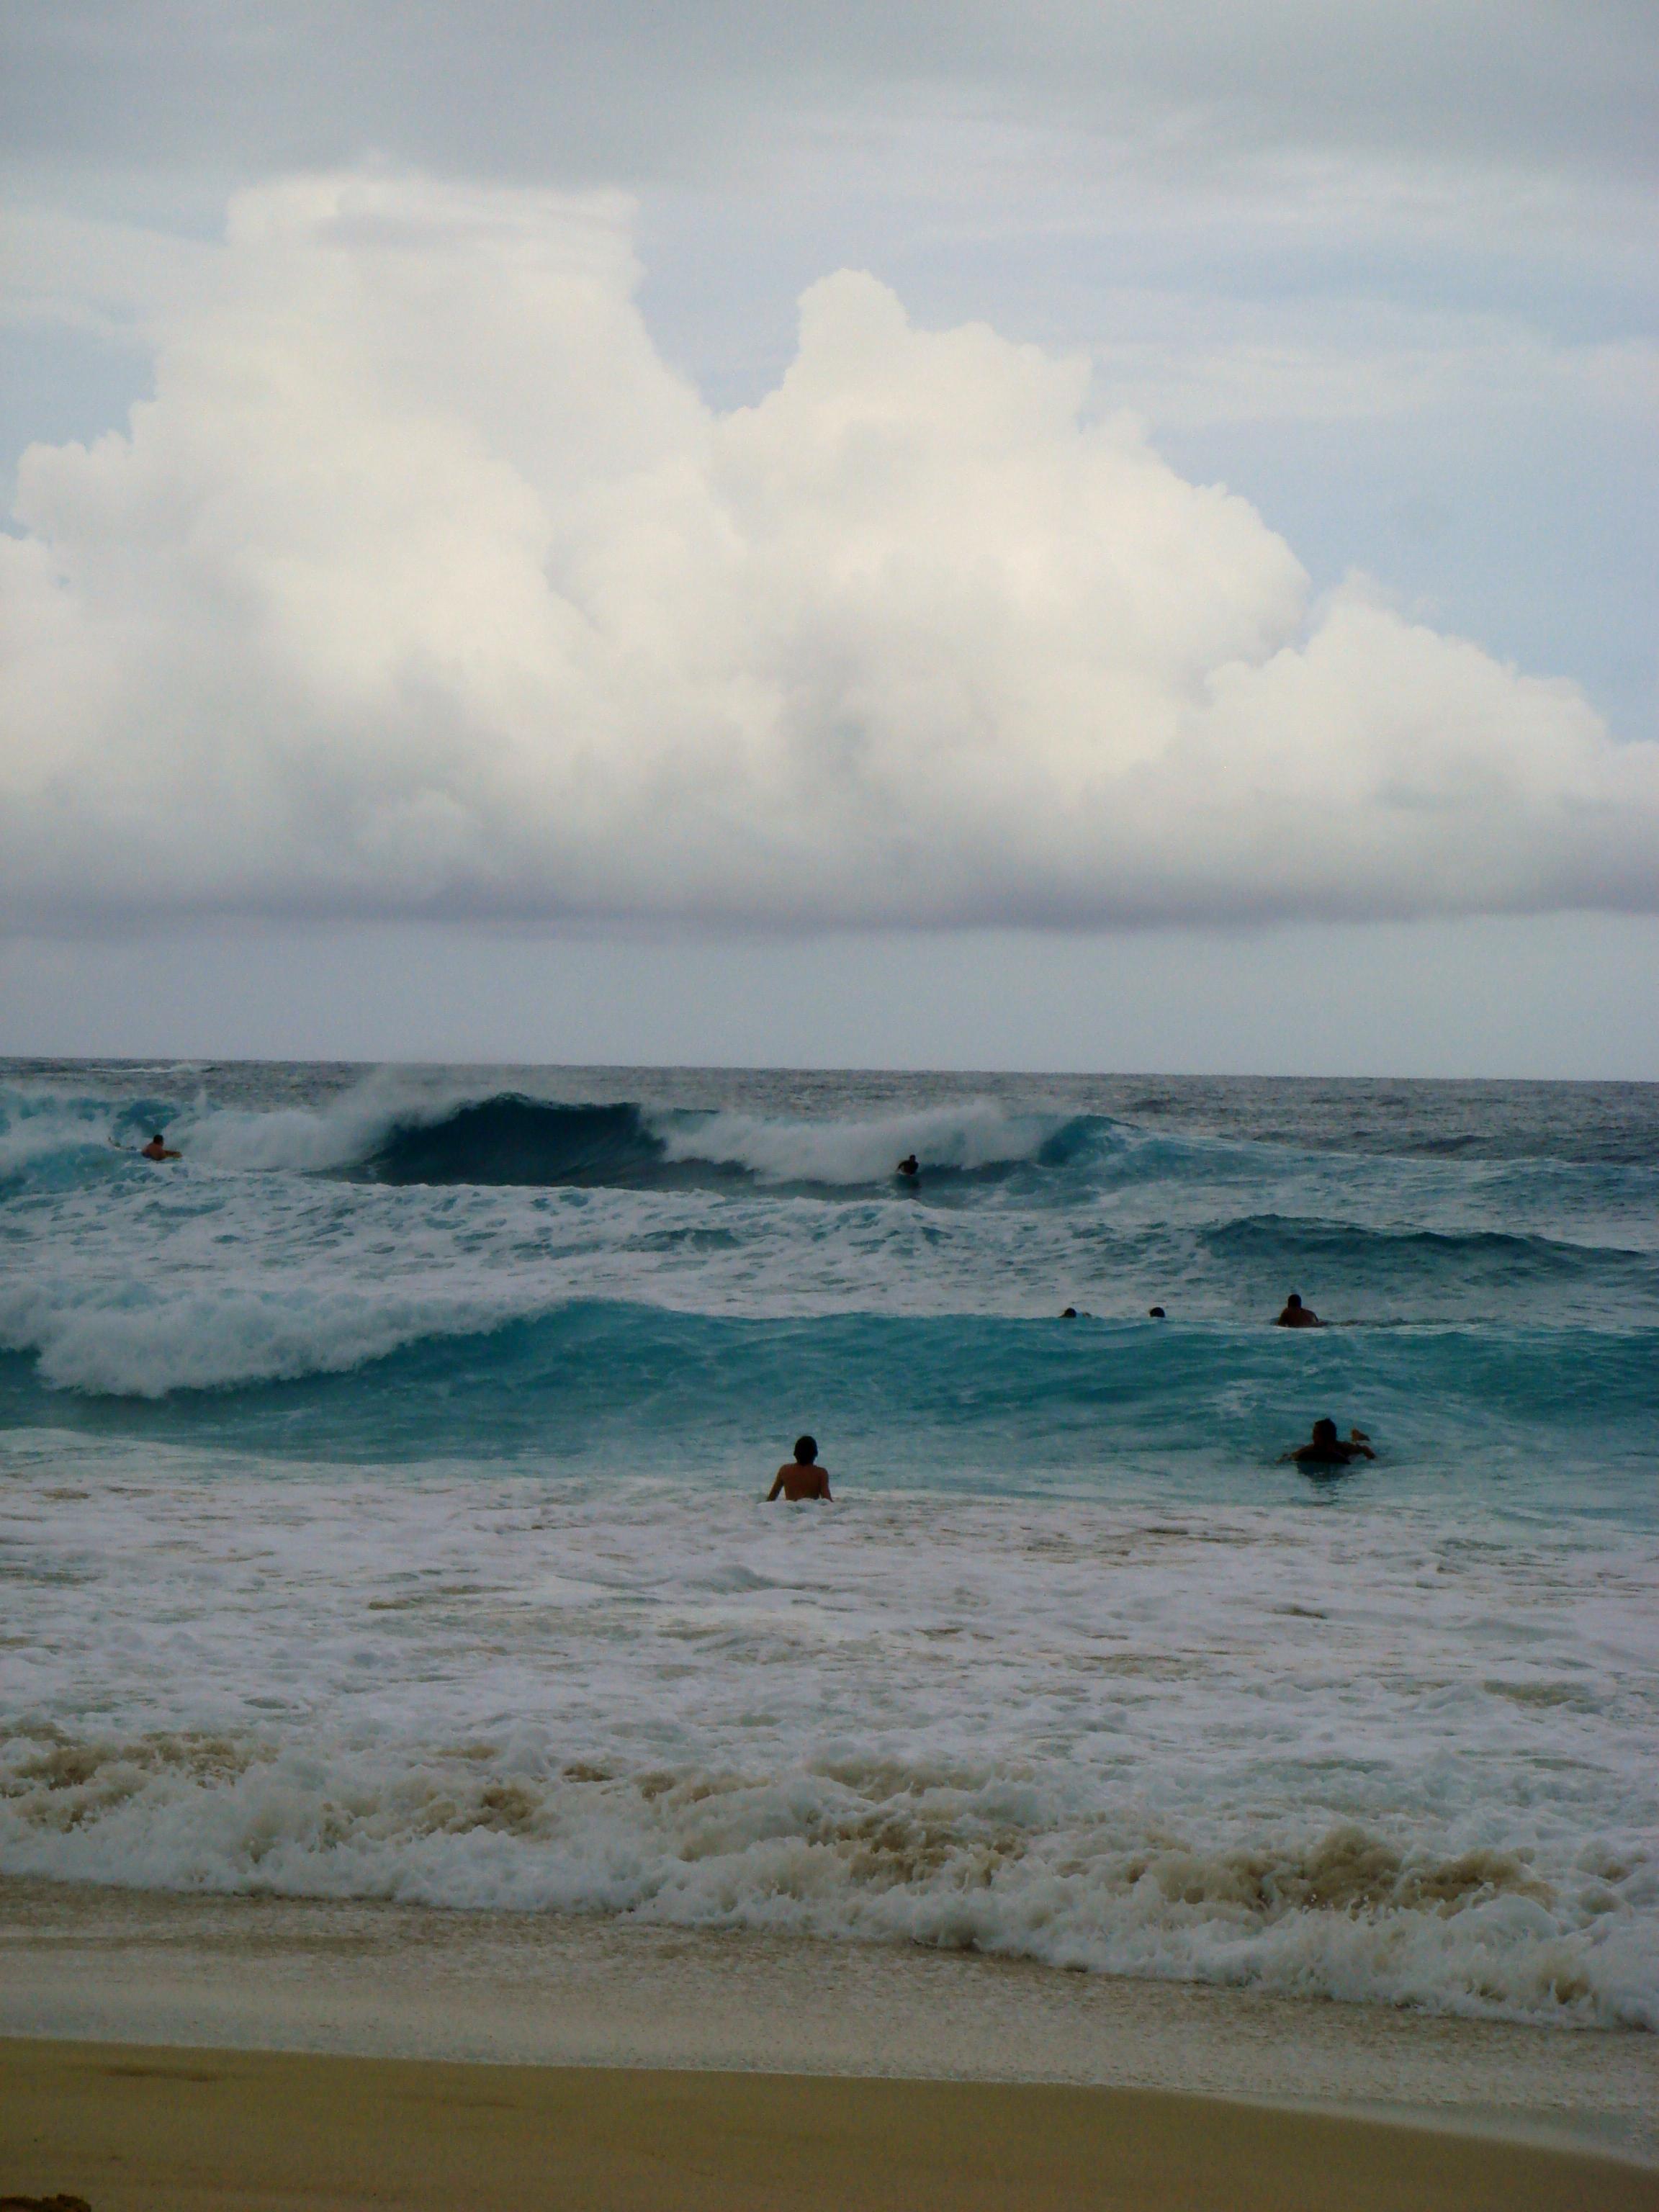 Waves after a storm on the island of Oahu, Hawaii